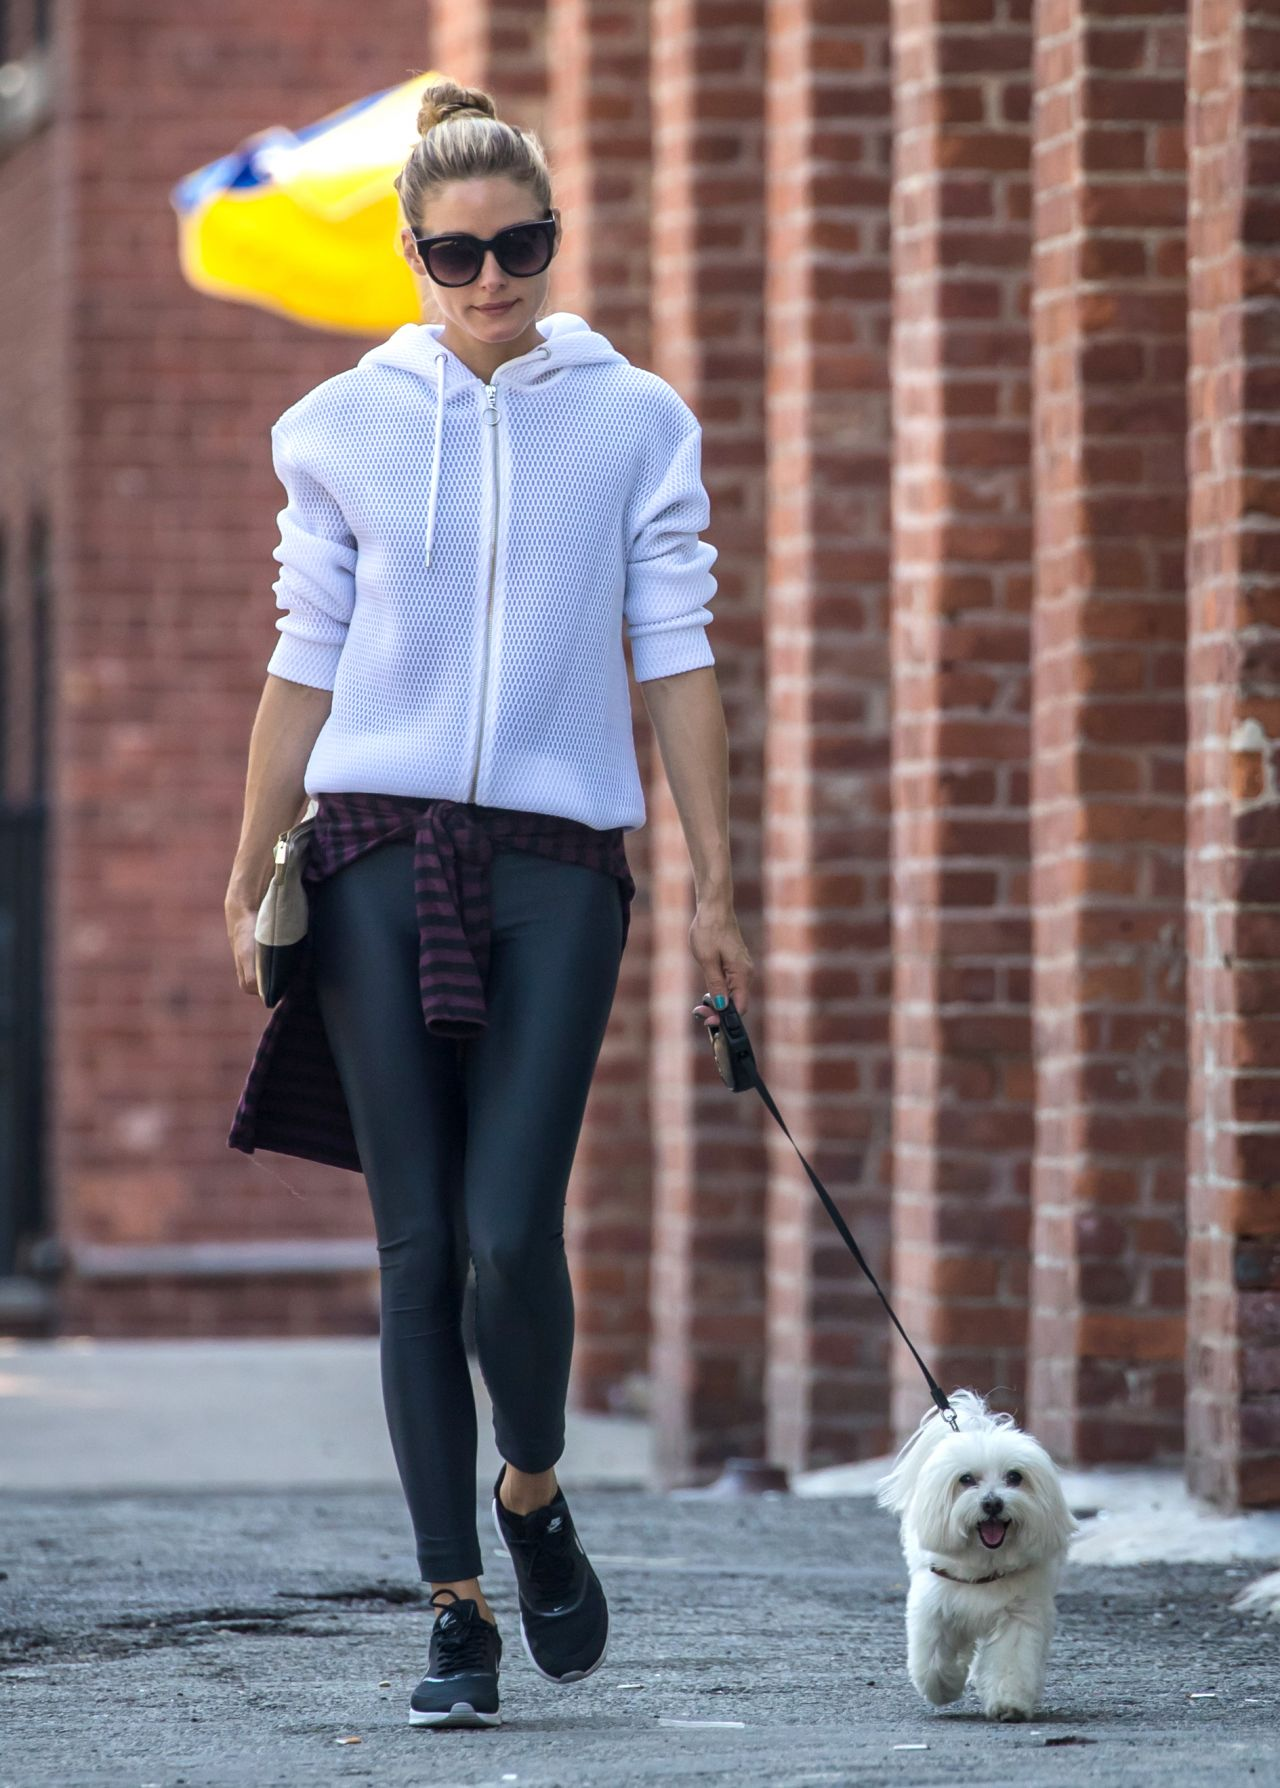 olivia-palermo-walking-her-dog-in-brooklyn-new-york-city-7-18-2016-6